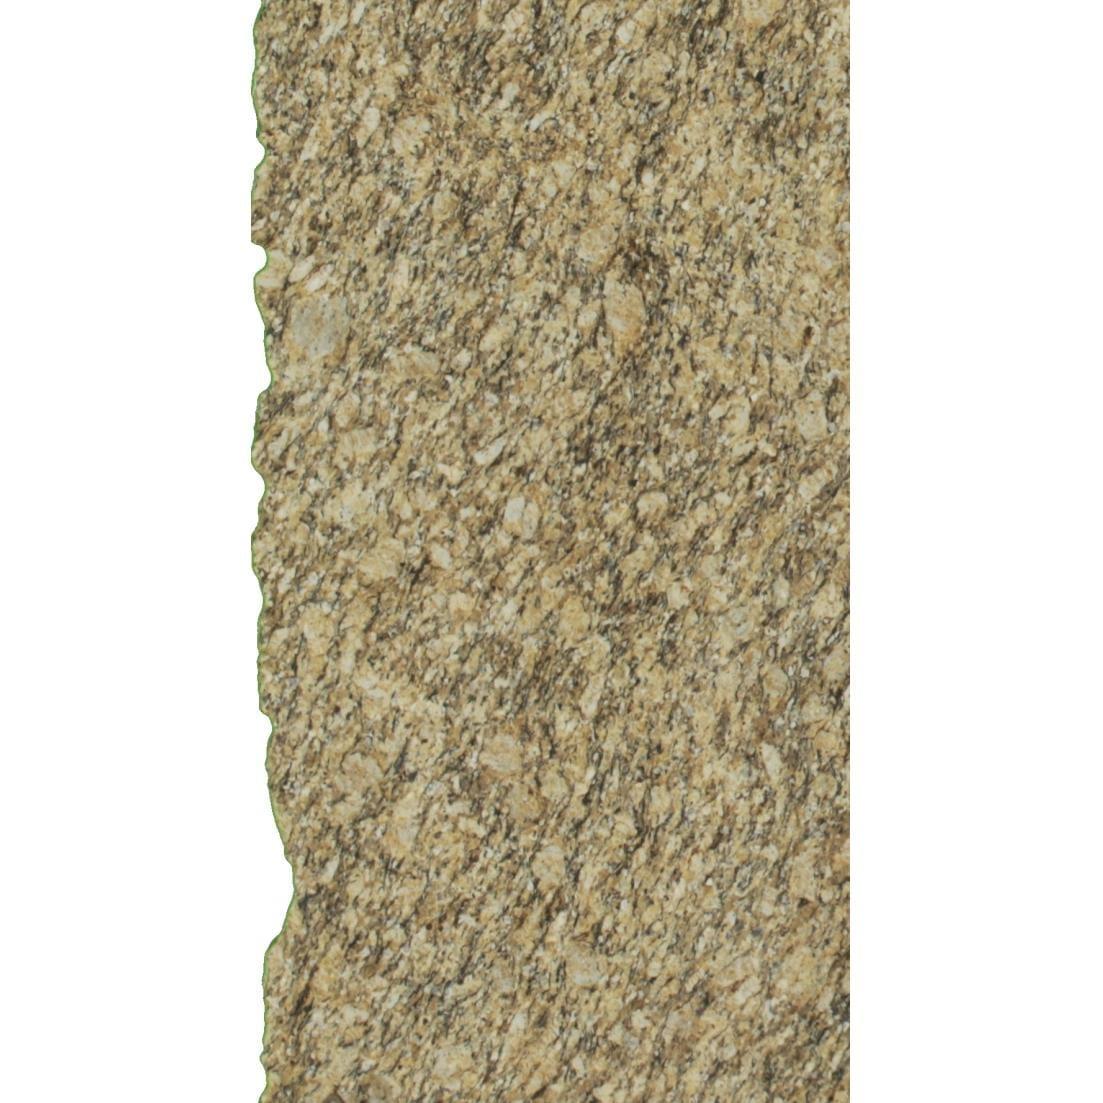 Image for Granite 16115-1-1: St. Cecelia